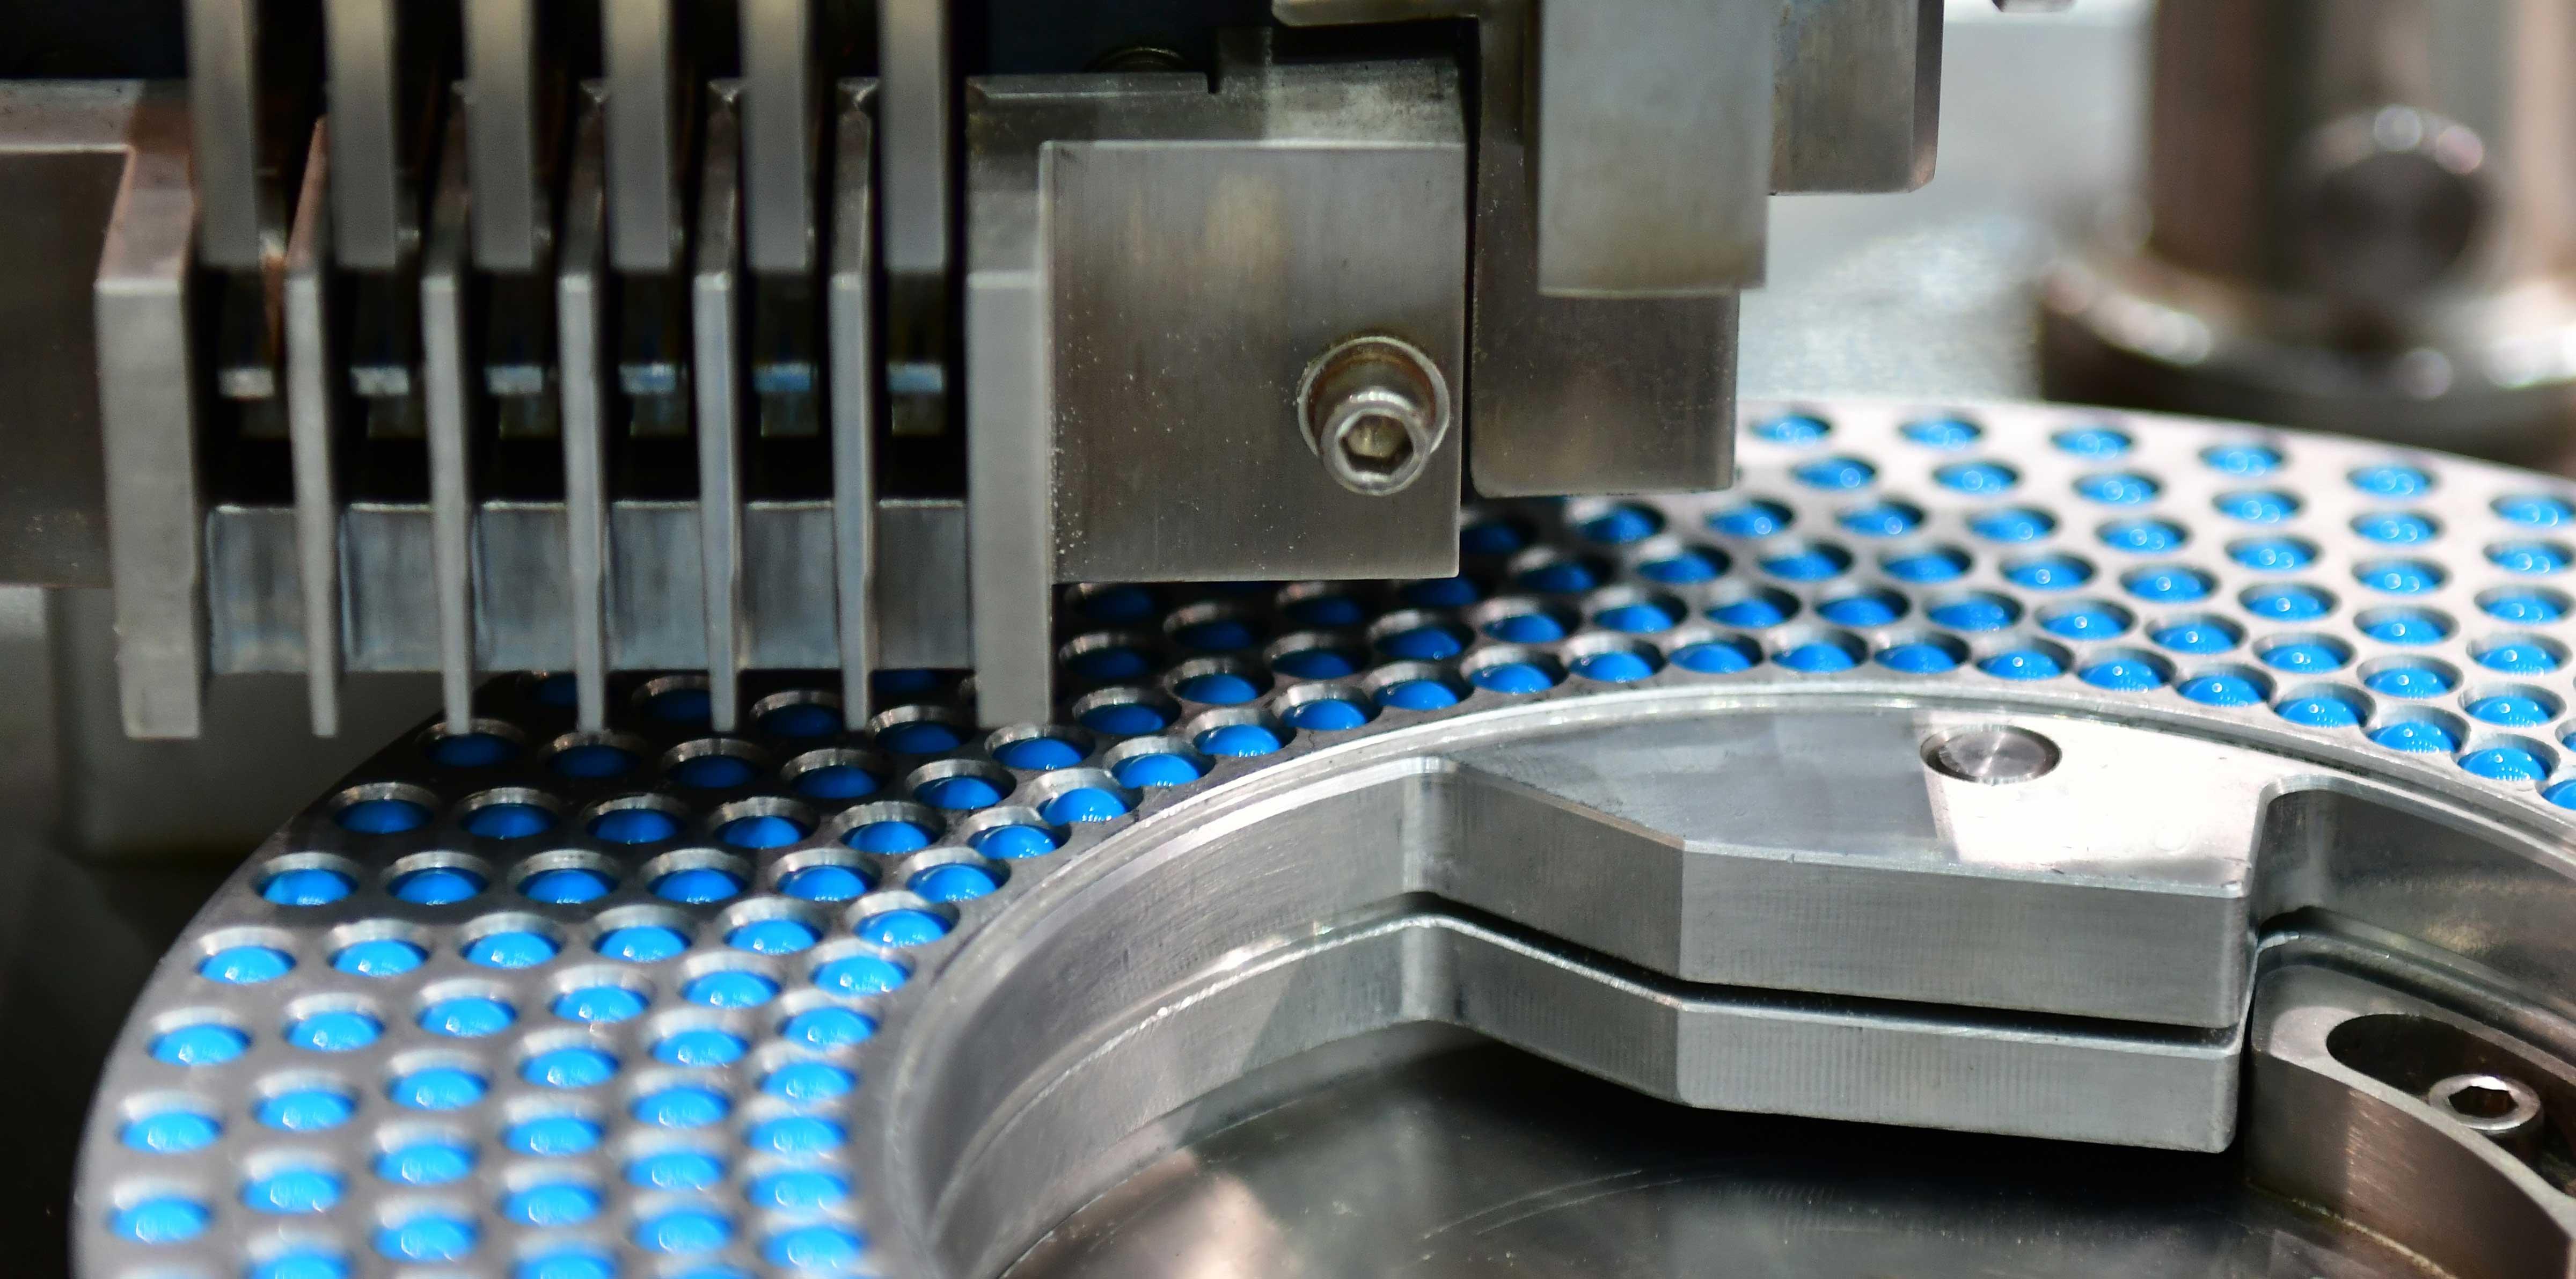 blue-capsule-medicine-pill-production-line